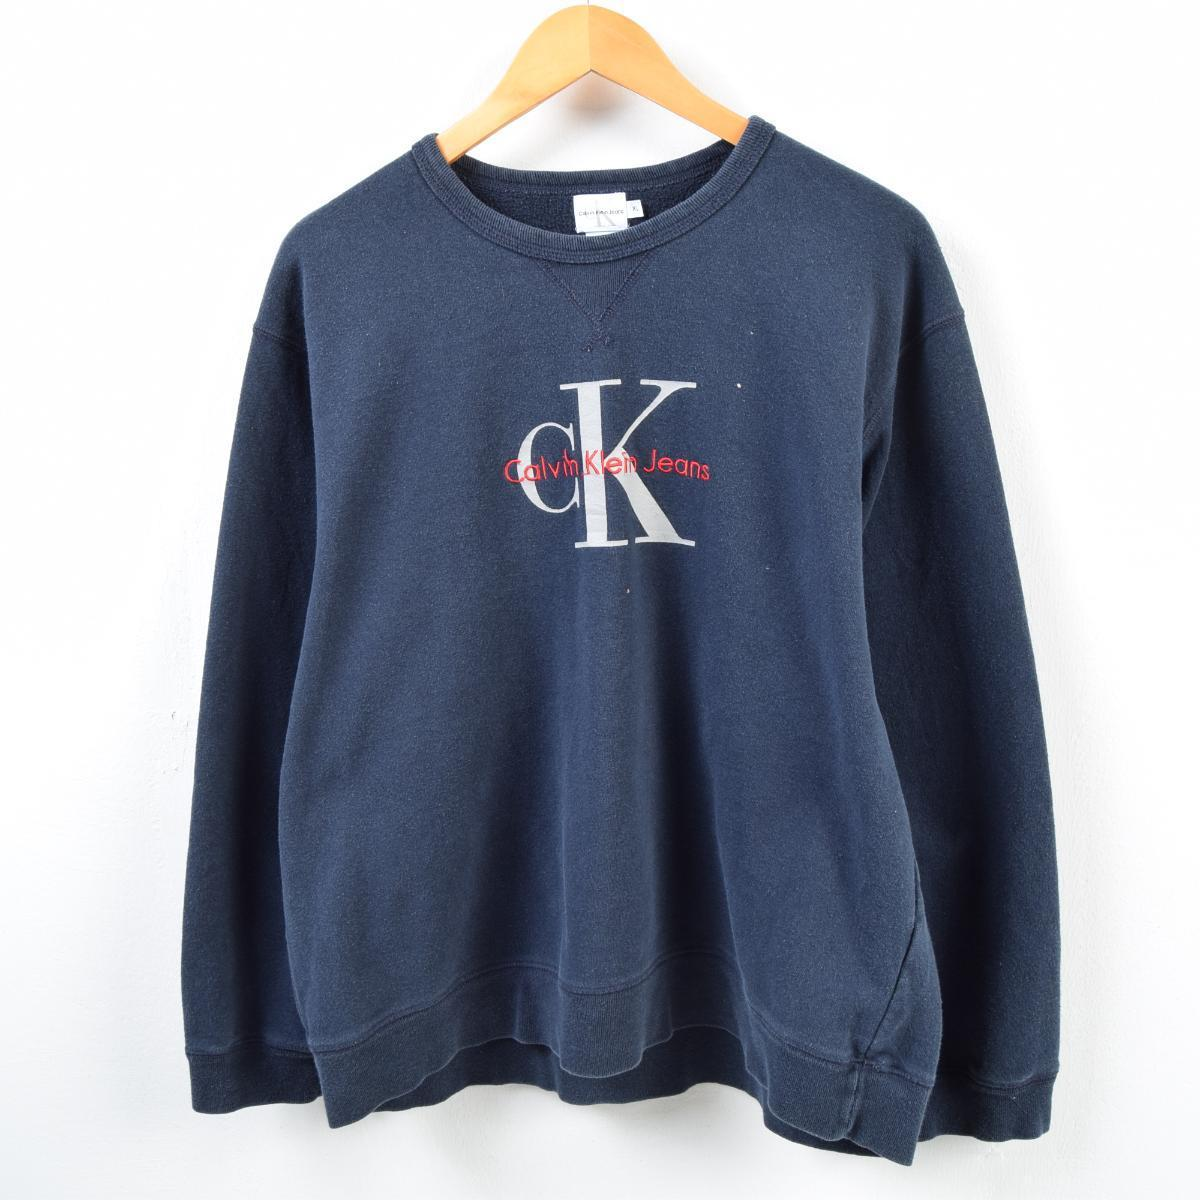 5a489d606 90s Calvin Klein Calvin klein JEANS logo sweat shirt trainer men L /wbc9612